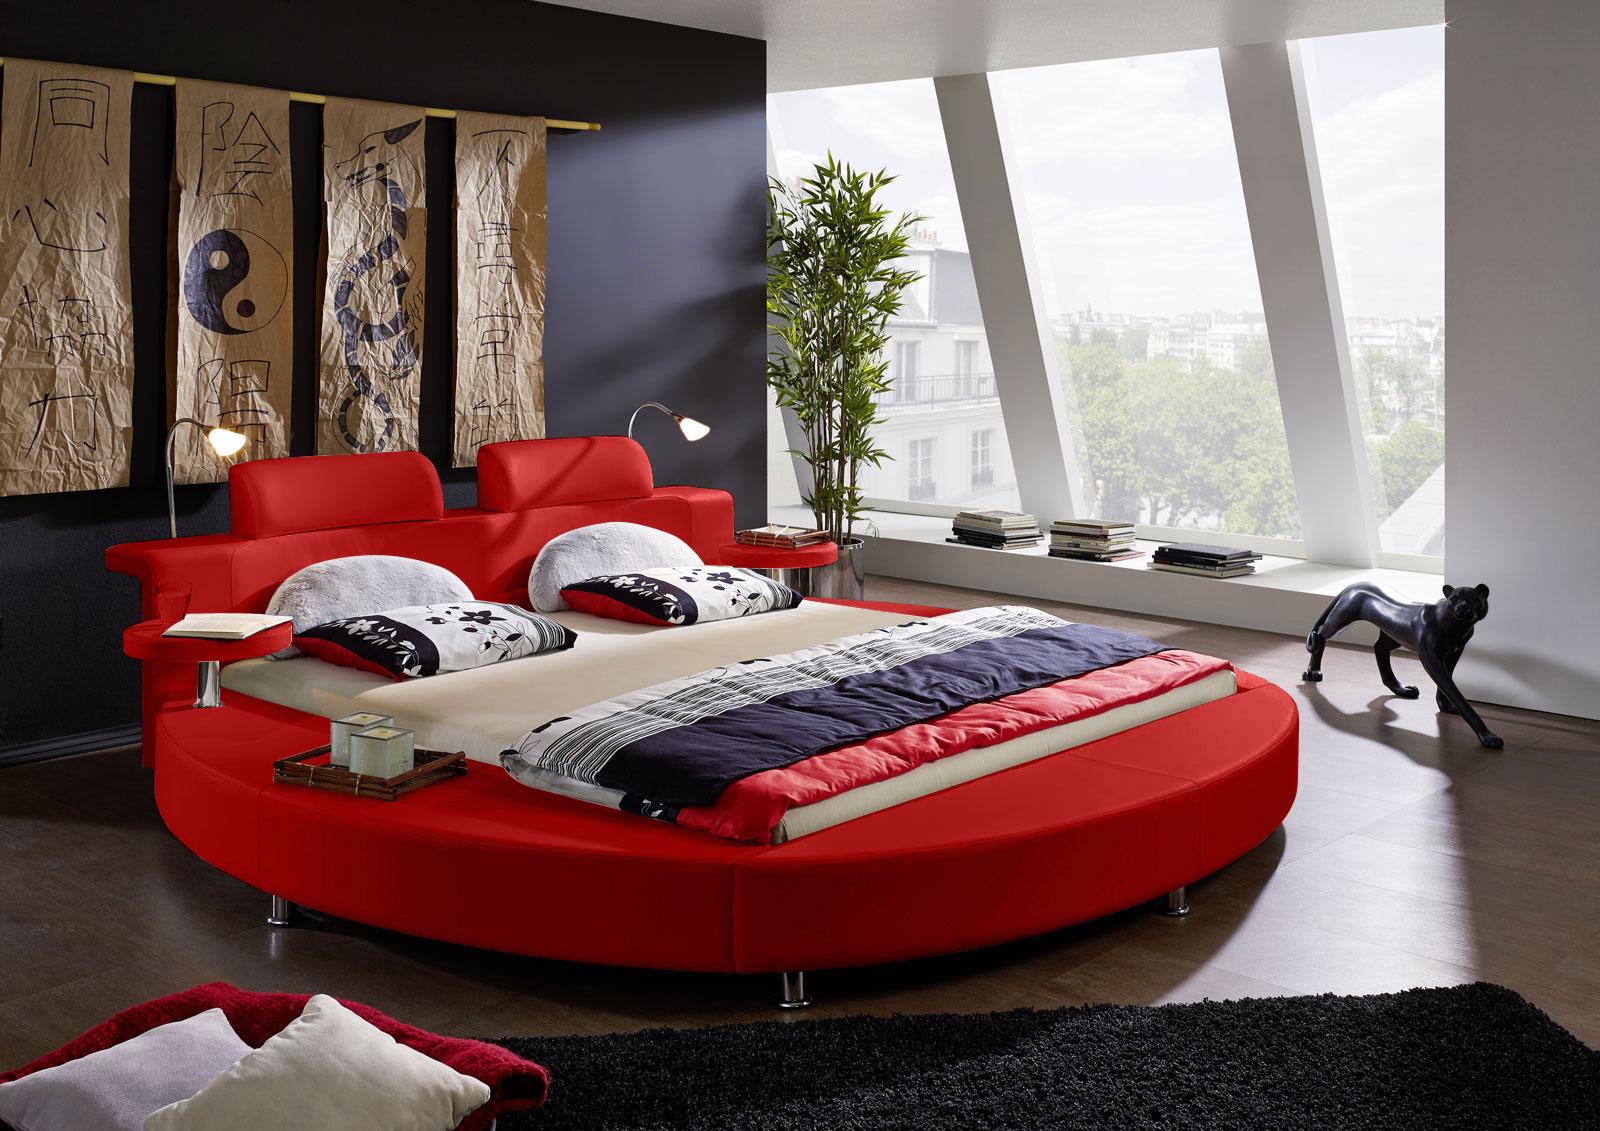 sam rundbett 180 x 200 cm beleuchtung rot classico demn chst. Black Bedroom Furniture Sets. Home Design Ideas